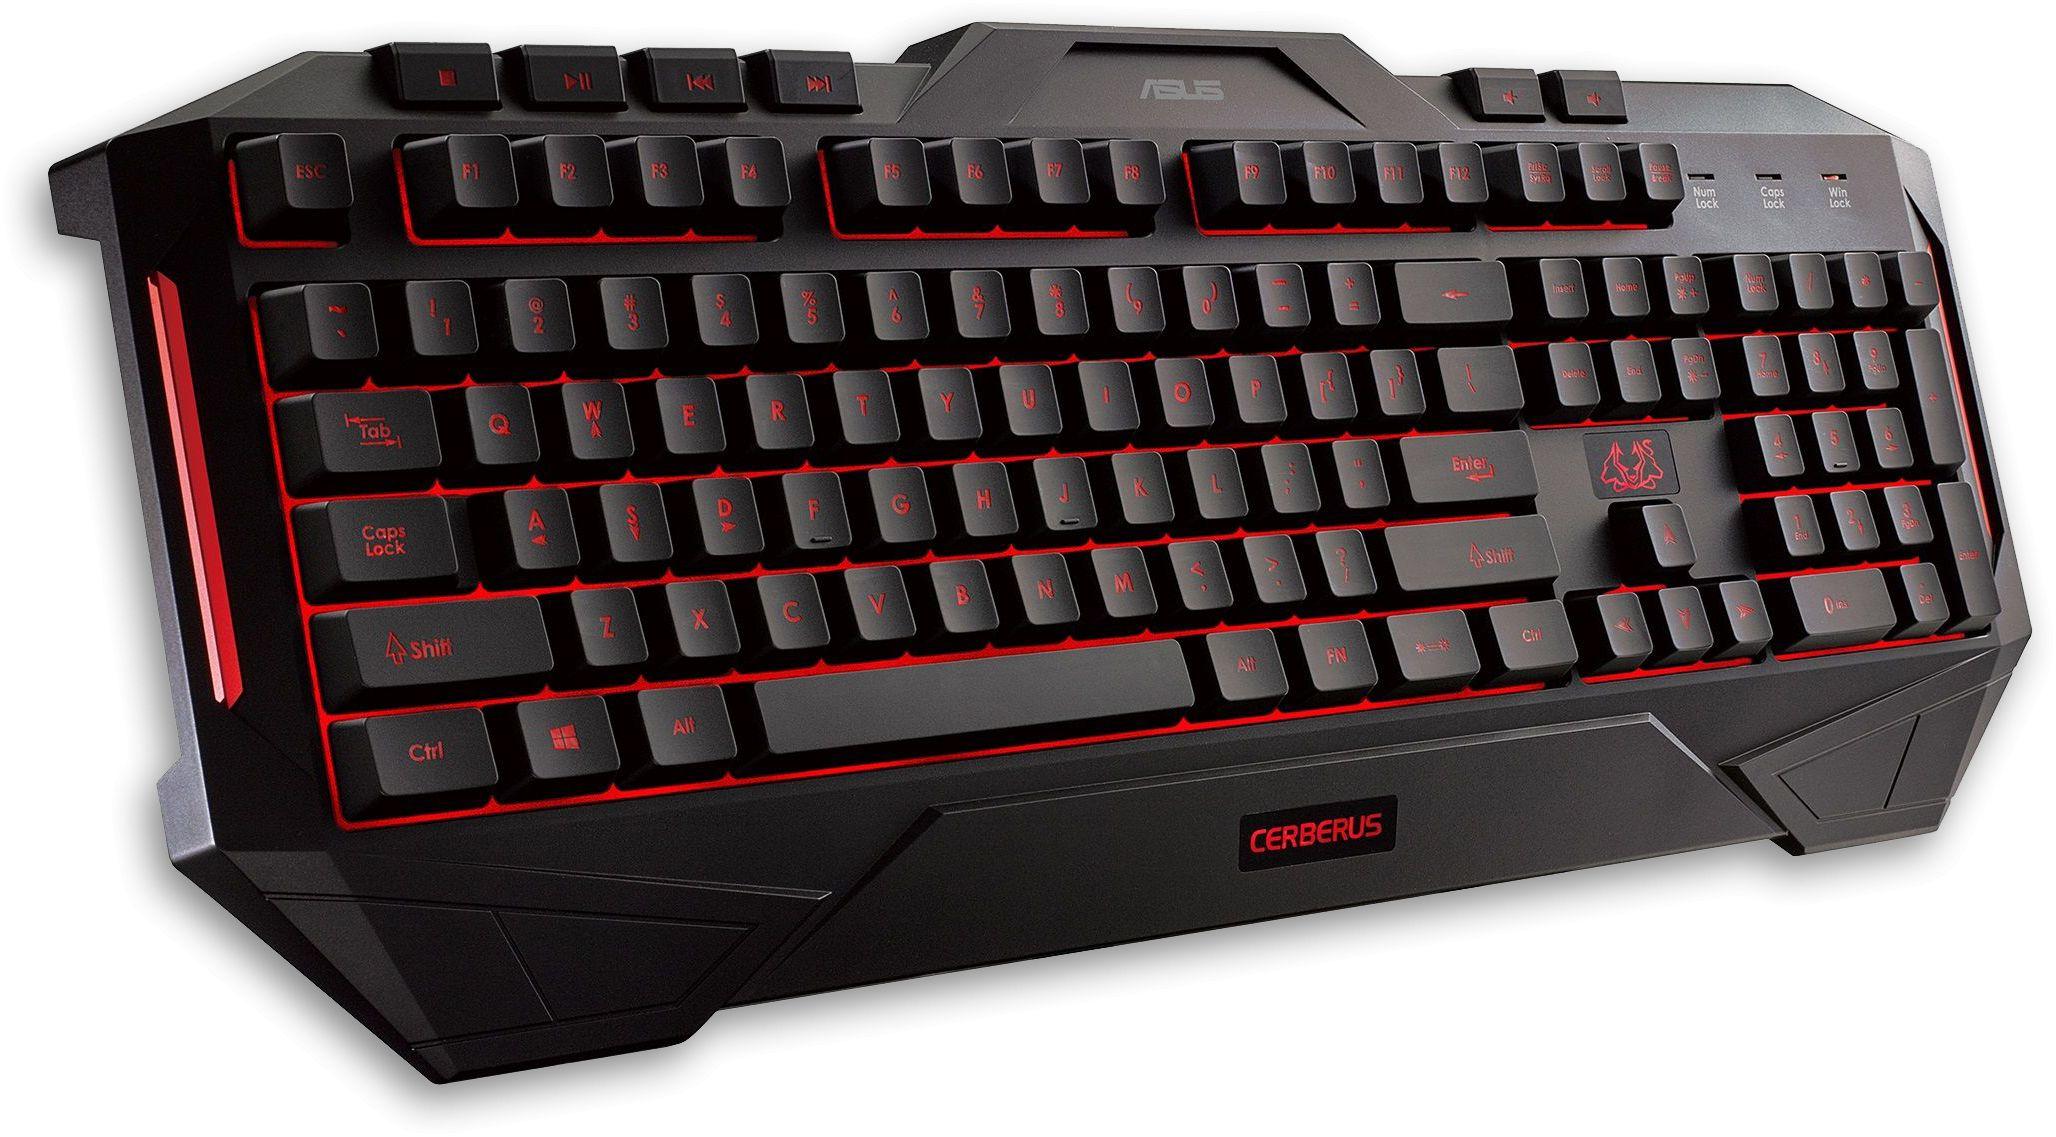 Cerberus Black LED Gaming Keyboard (UK Layout)